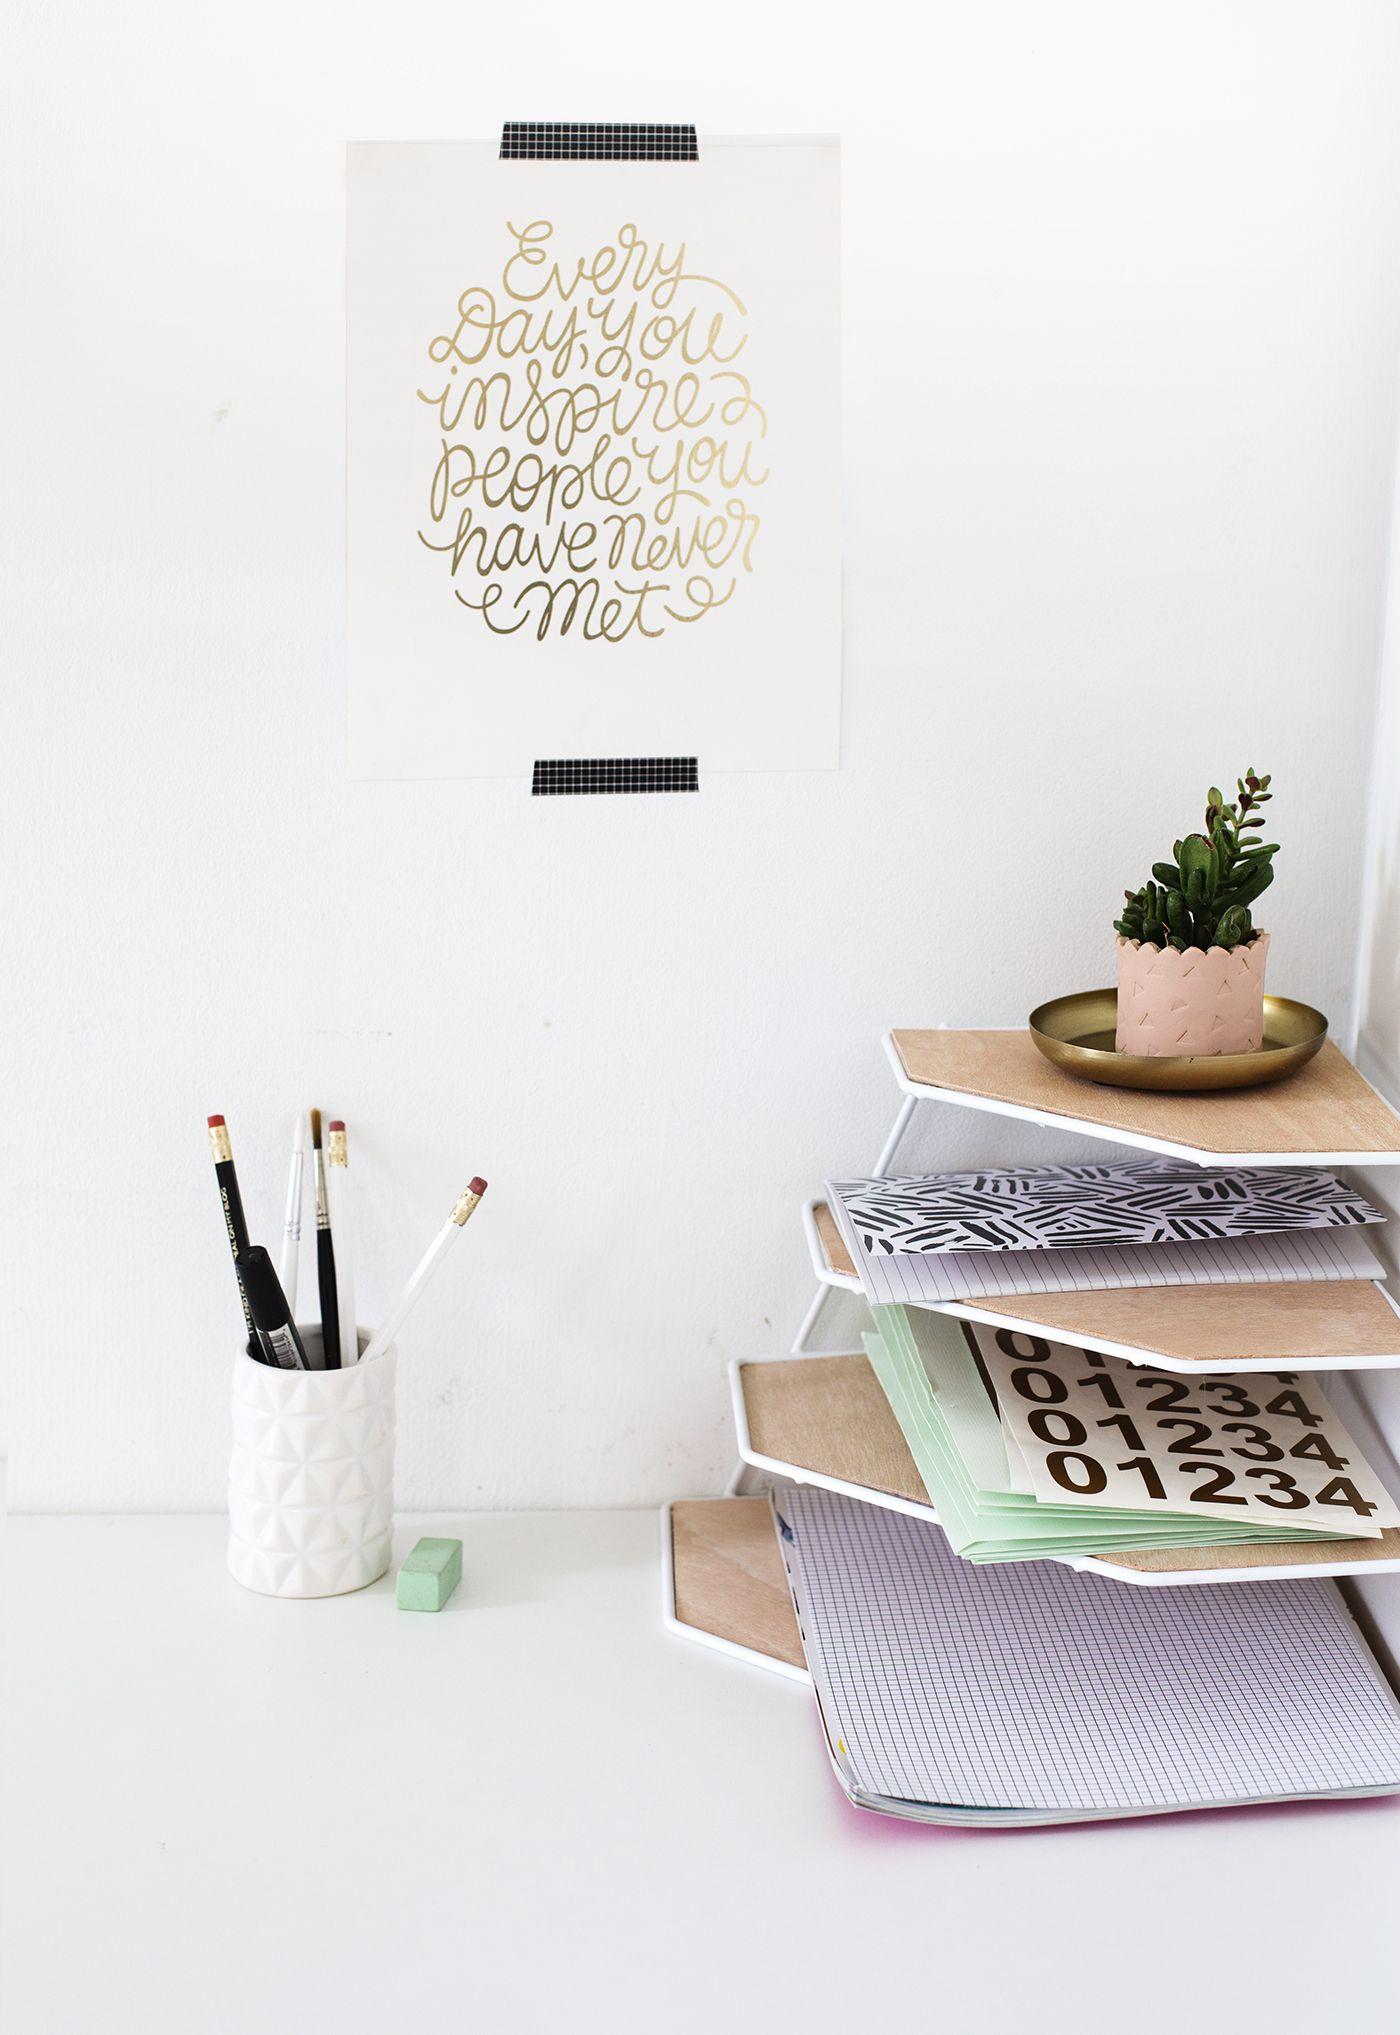 Diy balsa wood desk organiser tutorial workspace tidy up for Diy desk decor pinterest